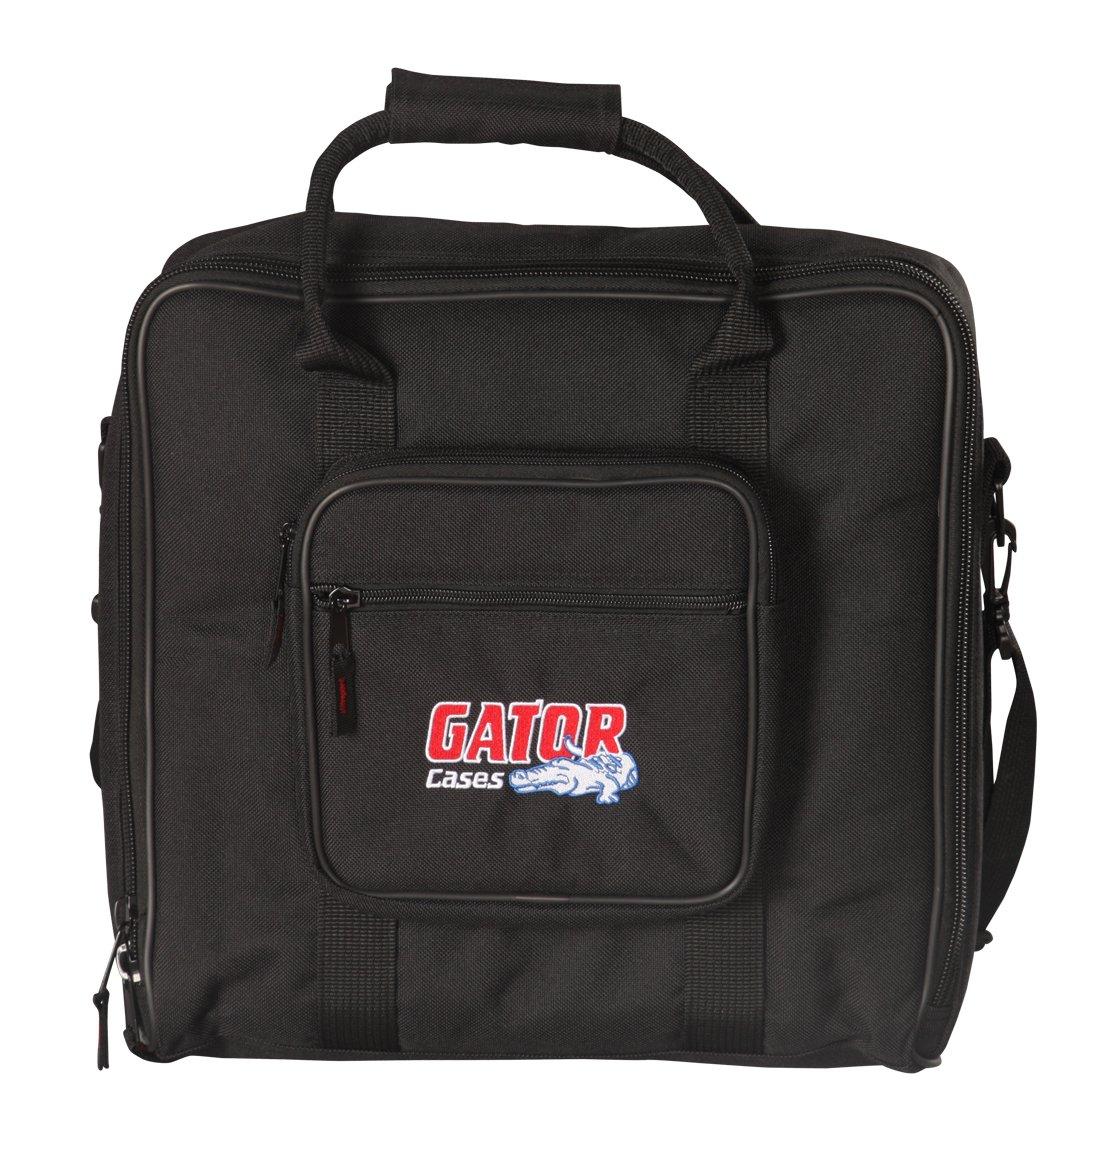 Gator 15 x 15 x 5.5 Inches Mixer/Gear Bag (G-MIX-B 1515) Gator Cases